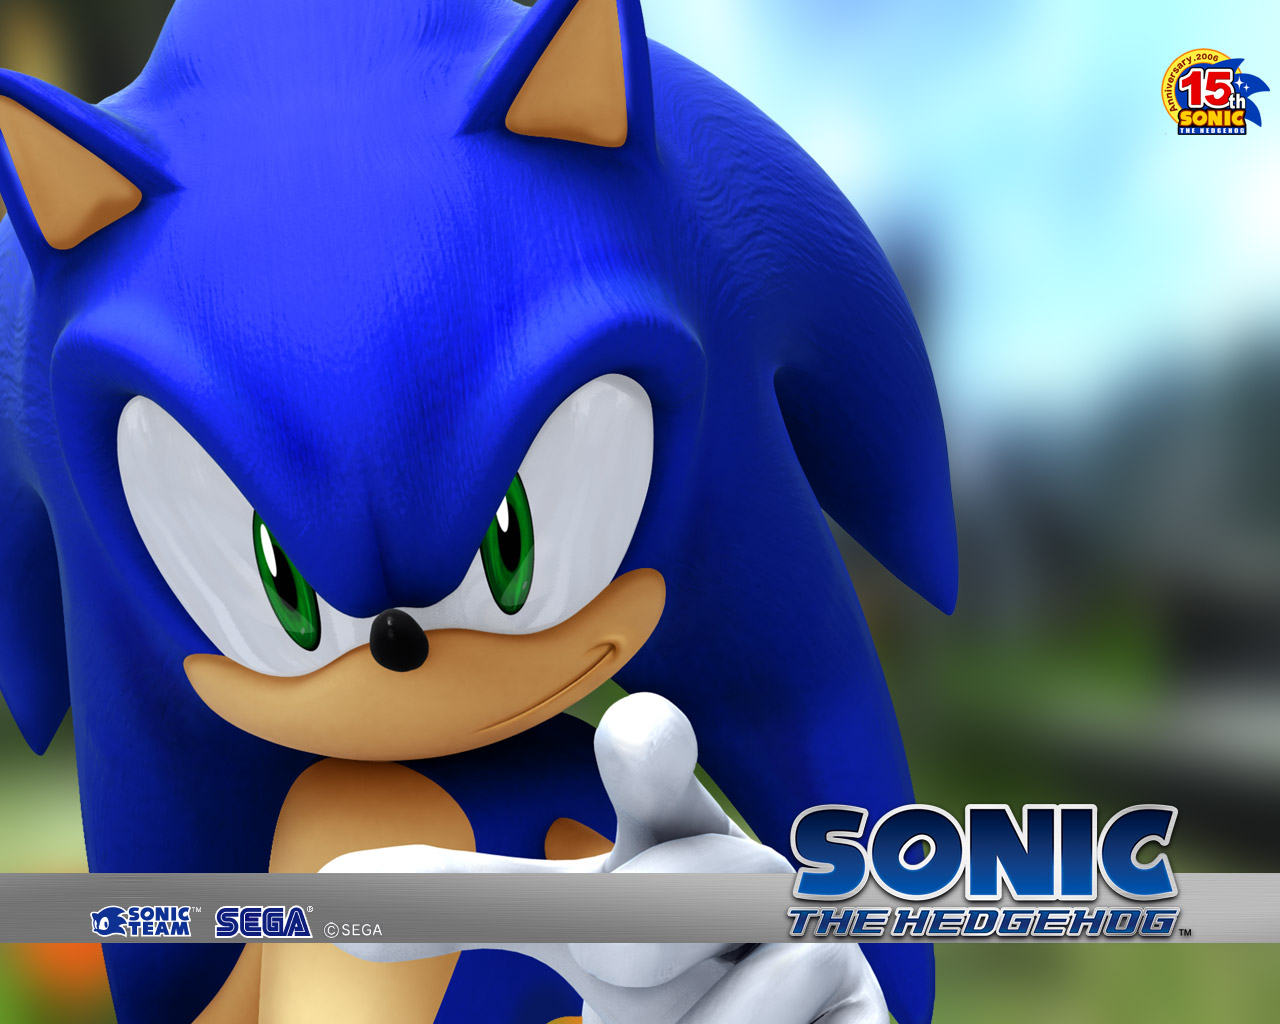 http://2.bp.blogspot.com/_GeHZaEdGW50/S8dCZhJy9wI/AAAAAAAAARw/vnCbIPl1cXA/s1600/sonic-the-hedgehog.jpg